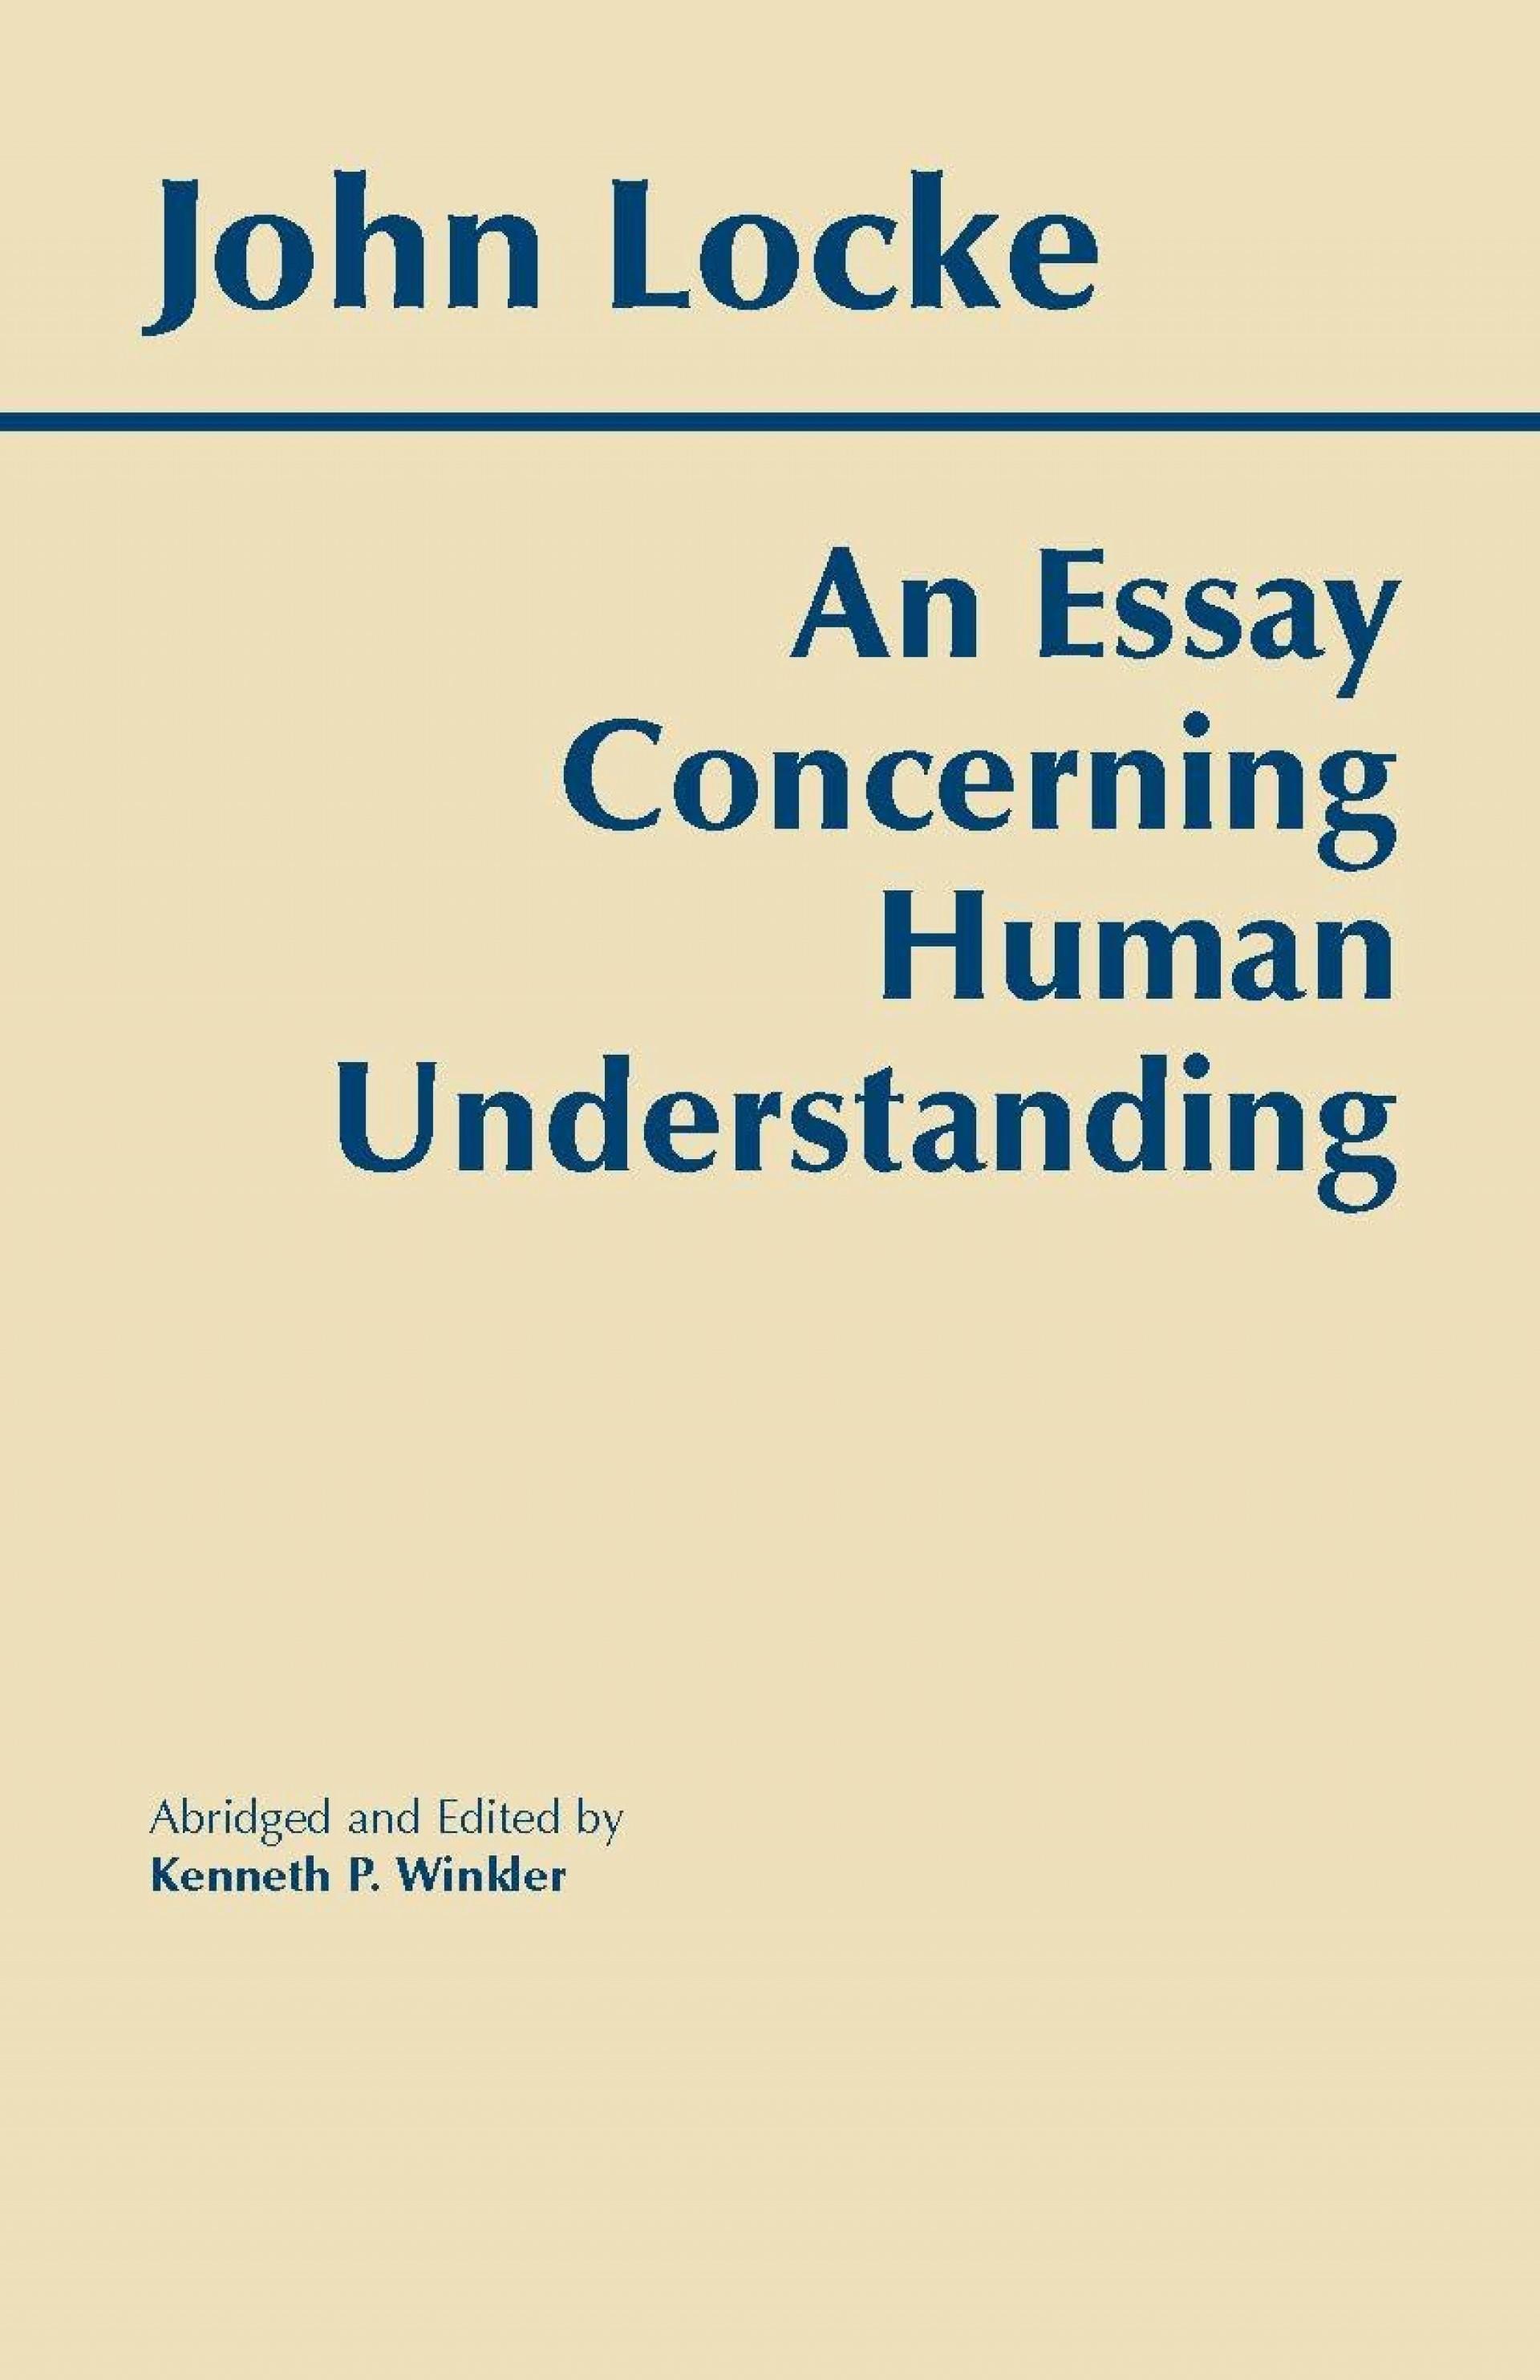 002 An Essay Concerning Human Understanding 61dxvs08kol Stunning Book 2 Chapter 27 Summary Locke Analysis John Tabula Rasa 1920